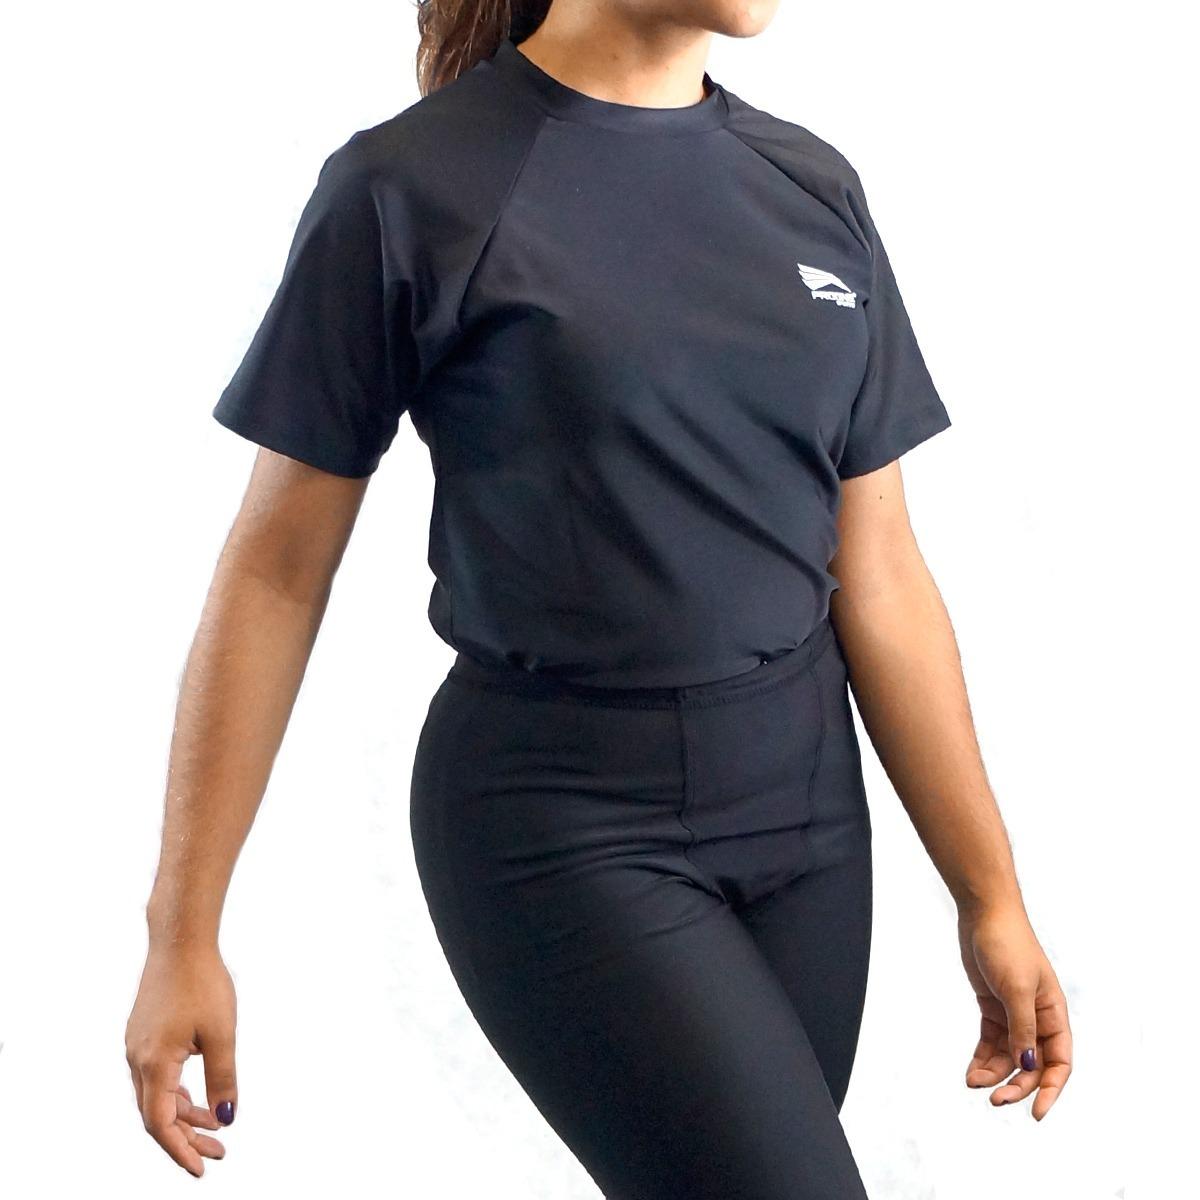 camisa térmica rash guard segunda pele manga curta progne. Carregando zoom. f6686ba6b90f7